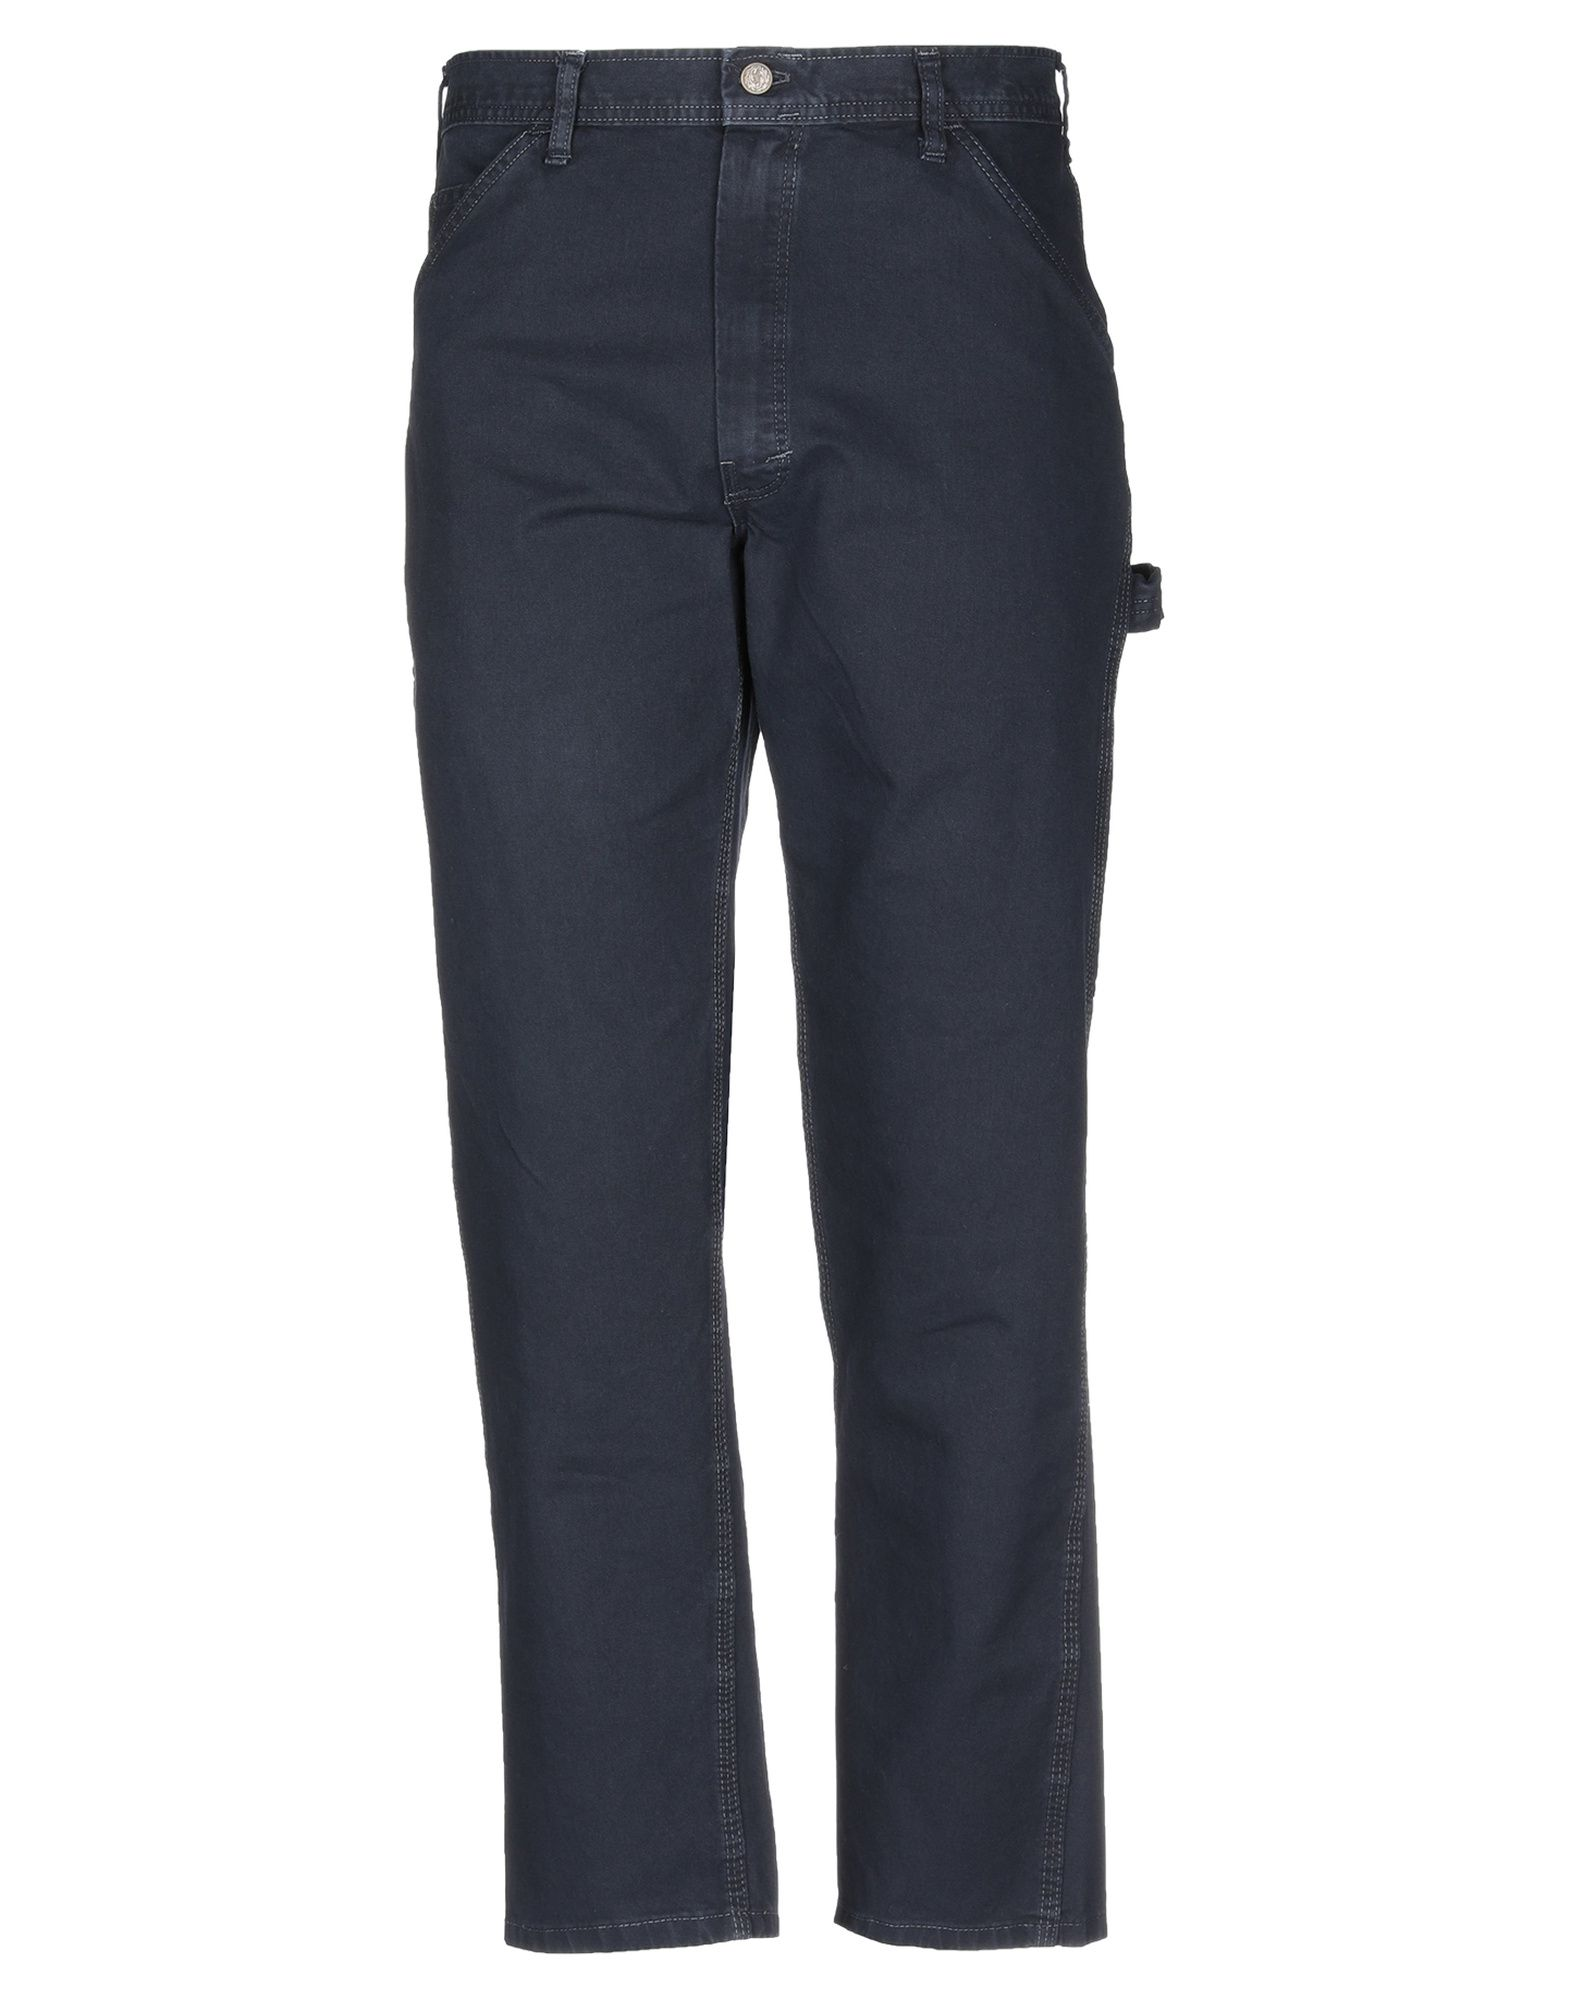 Фото - STAN RAY® Повседневные брюки dvd blu ray